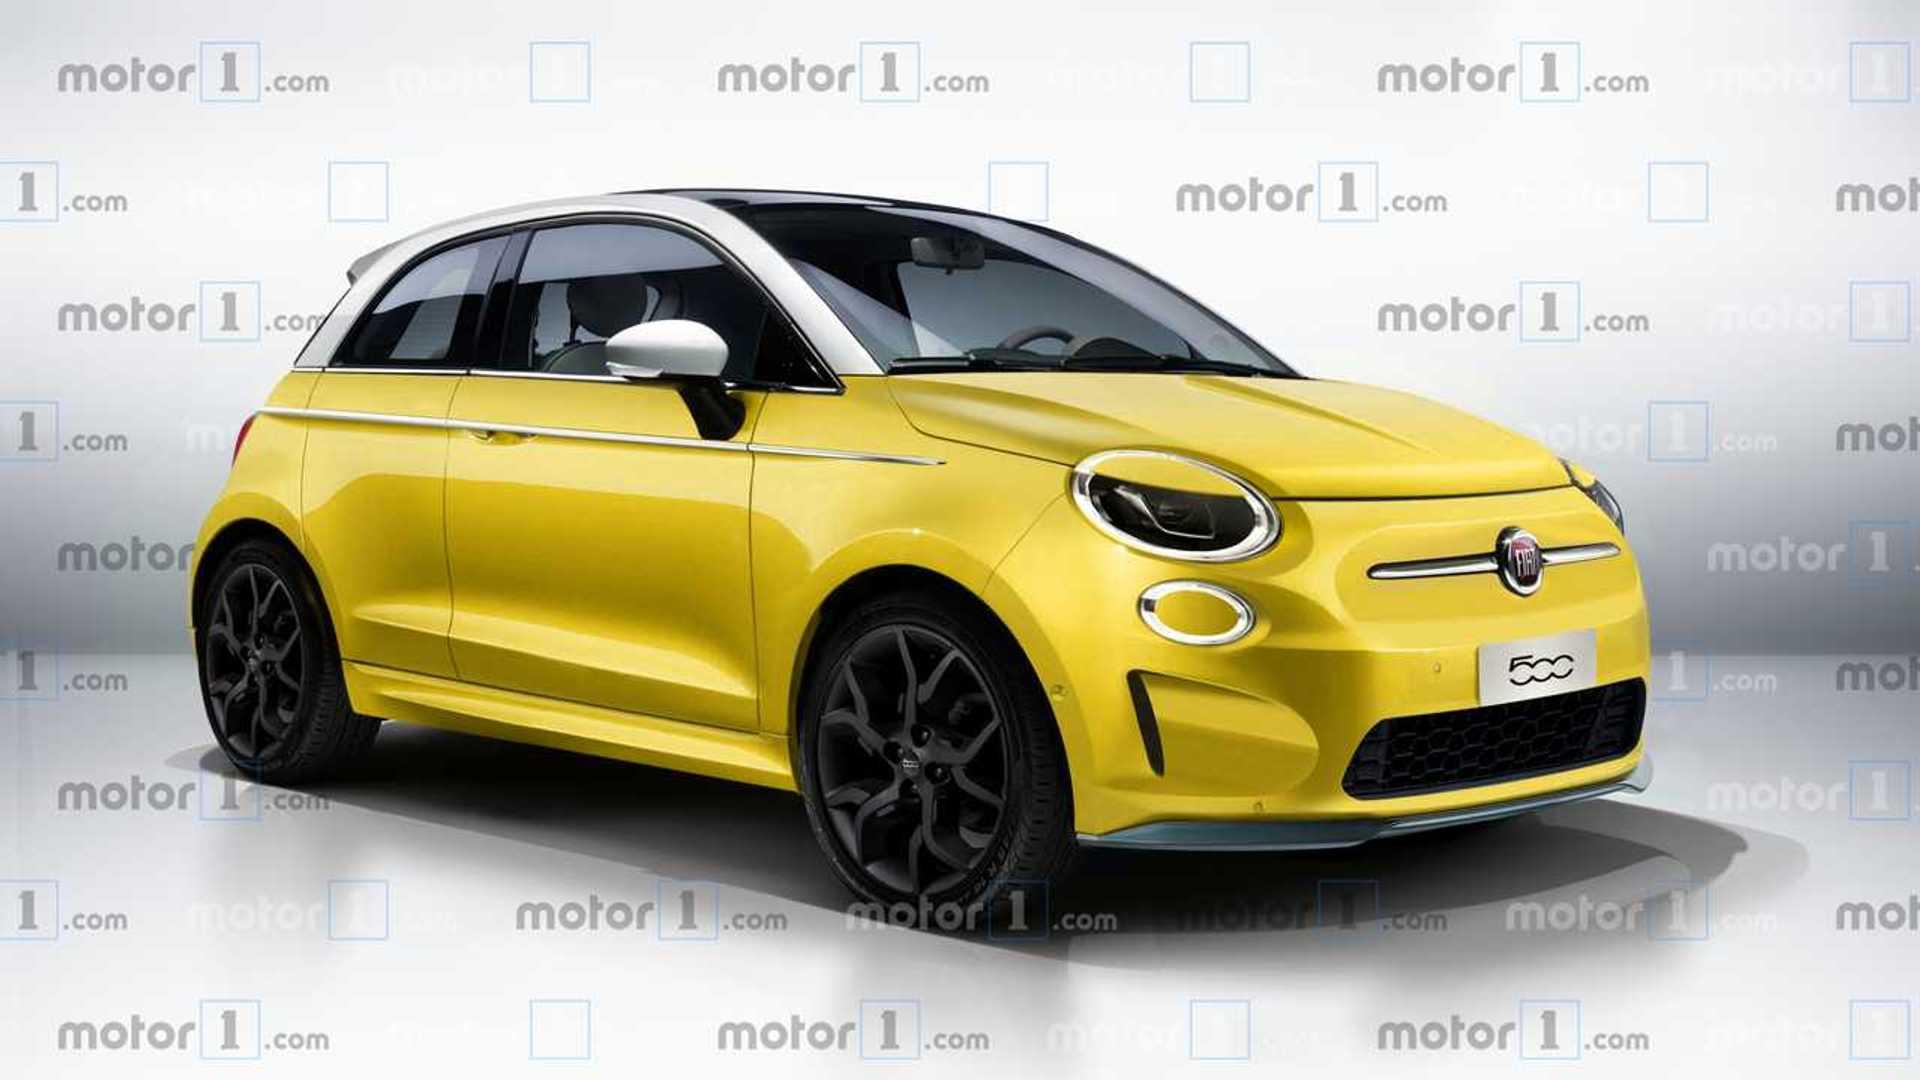 2020 Fiat Punto Images